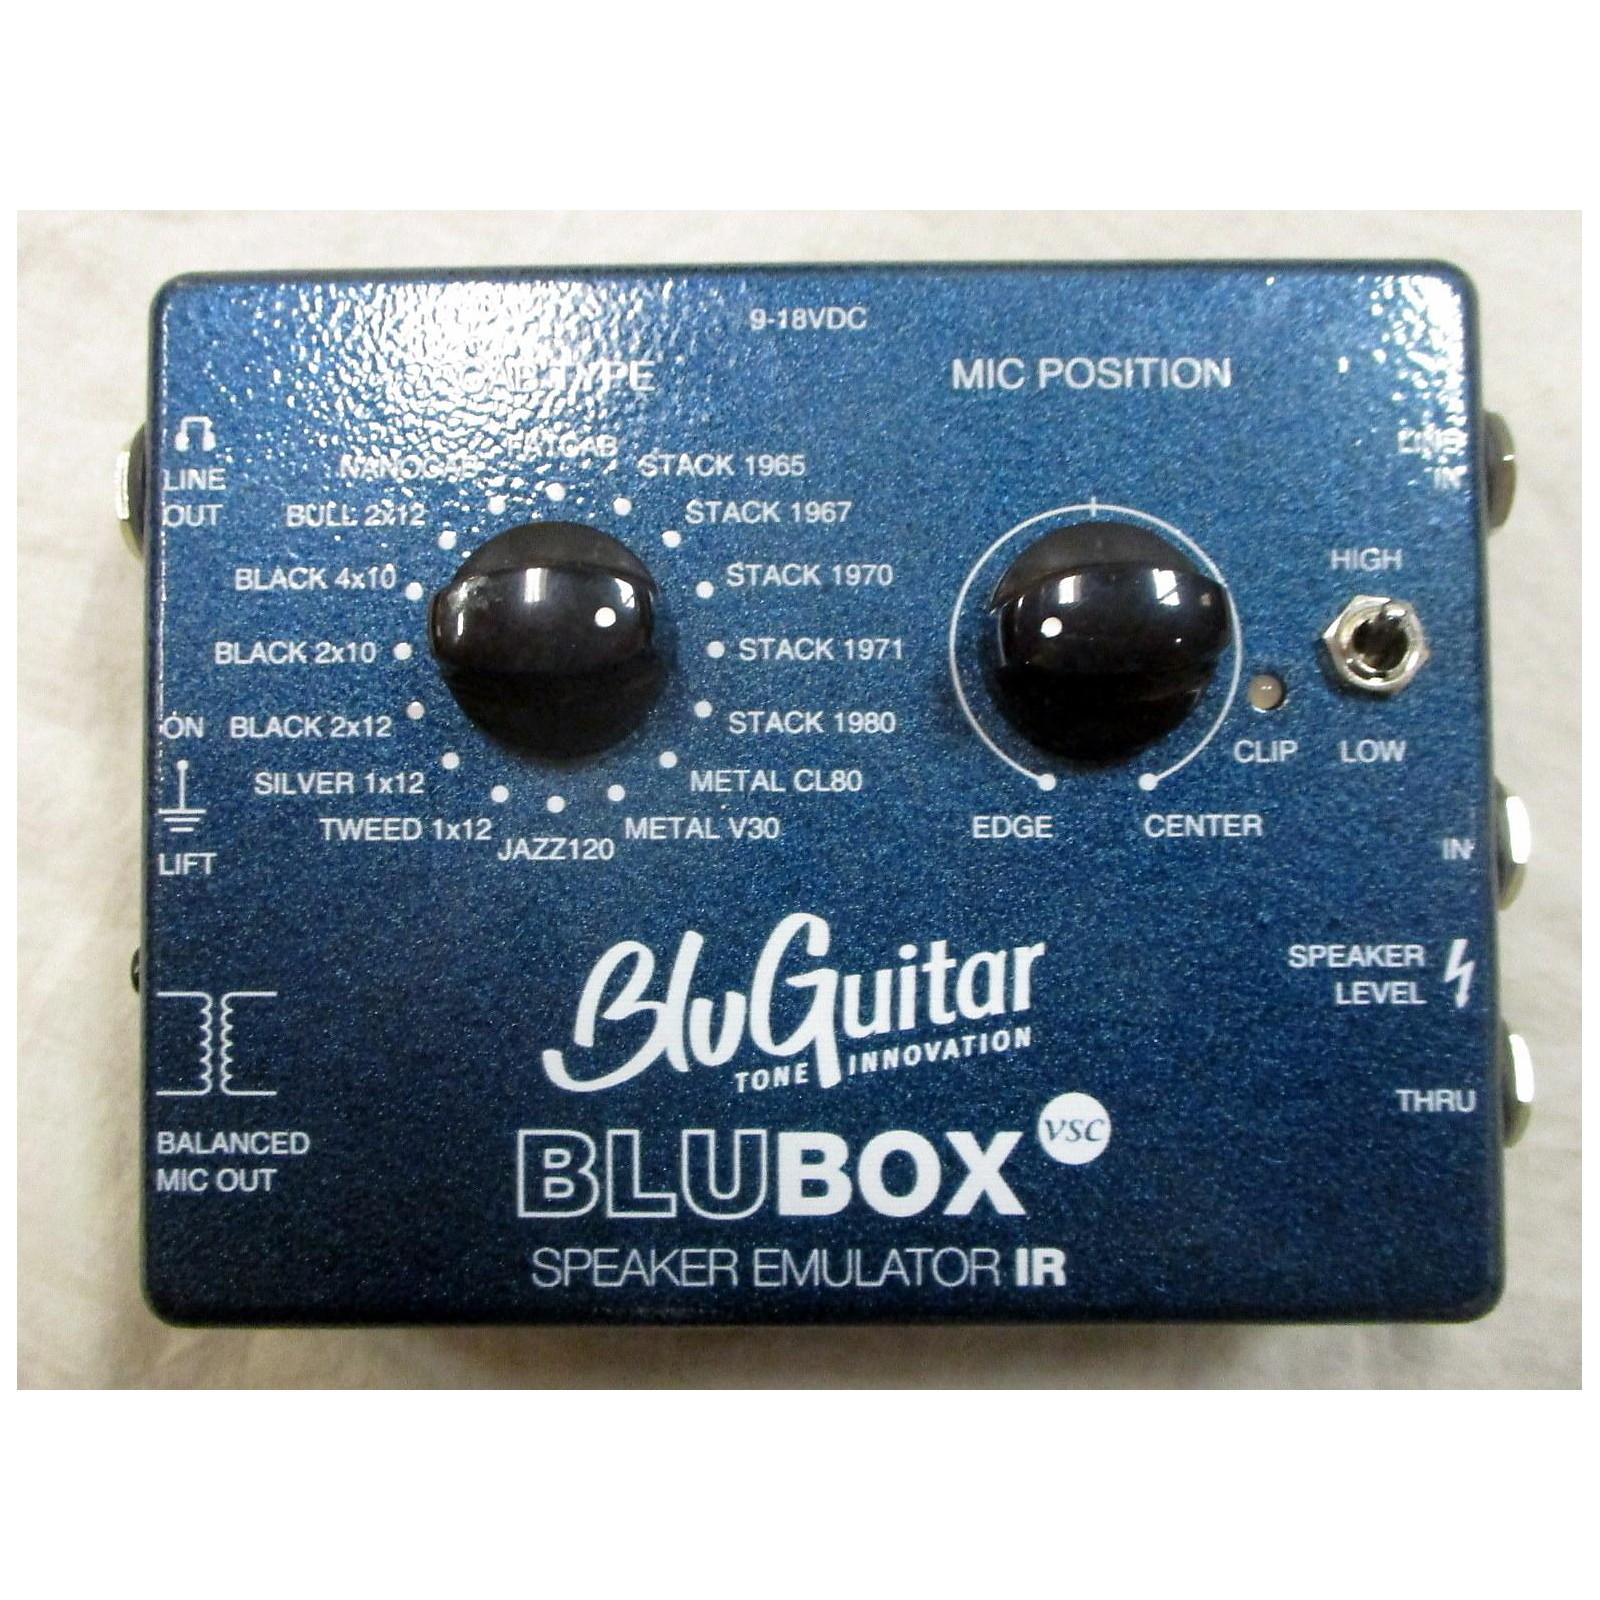 BluGuitar BluBox Speaker Emulator Pedal